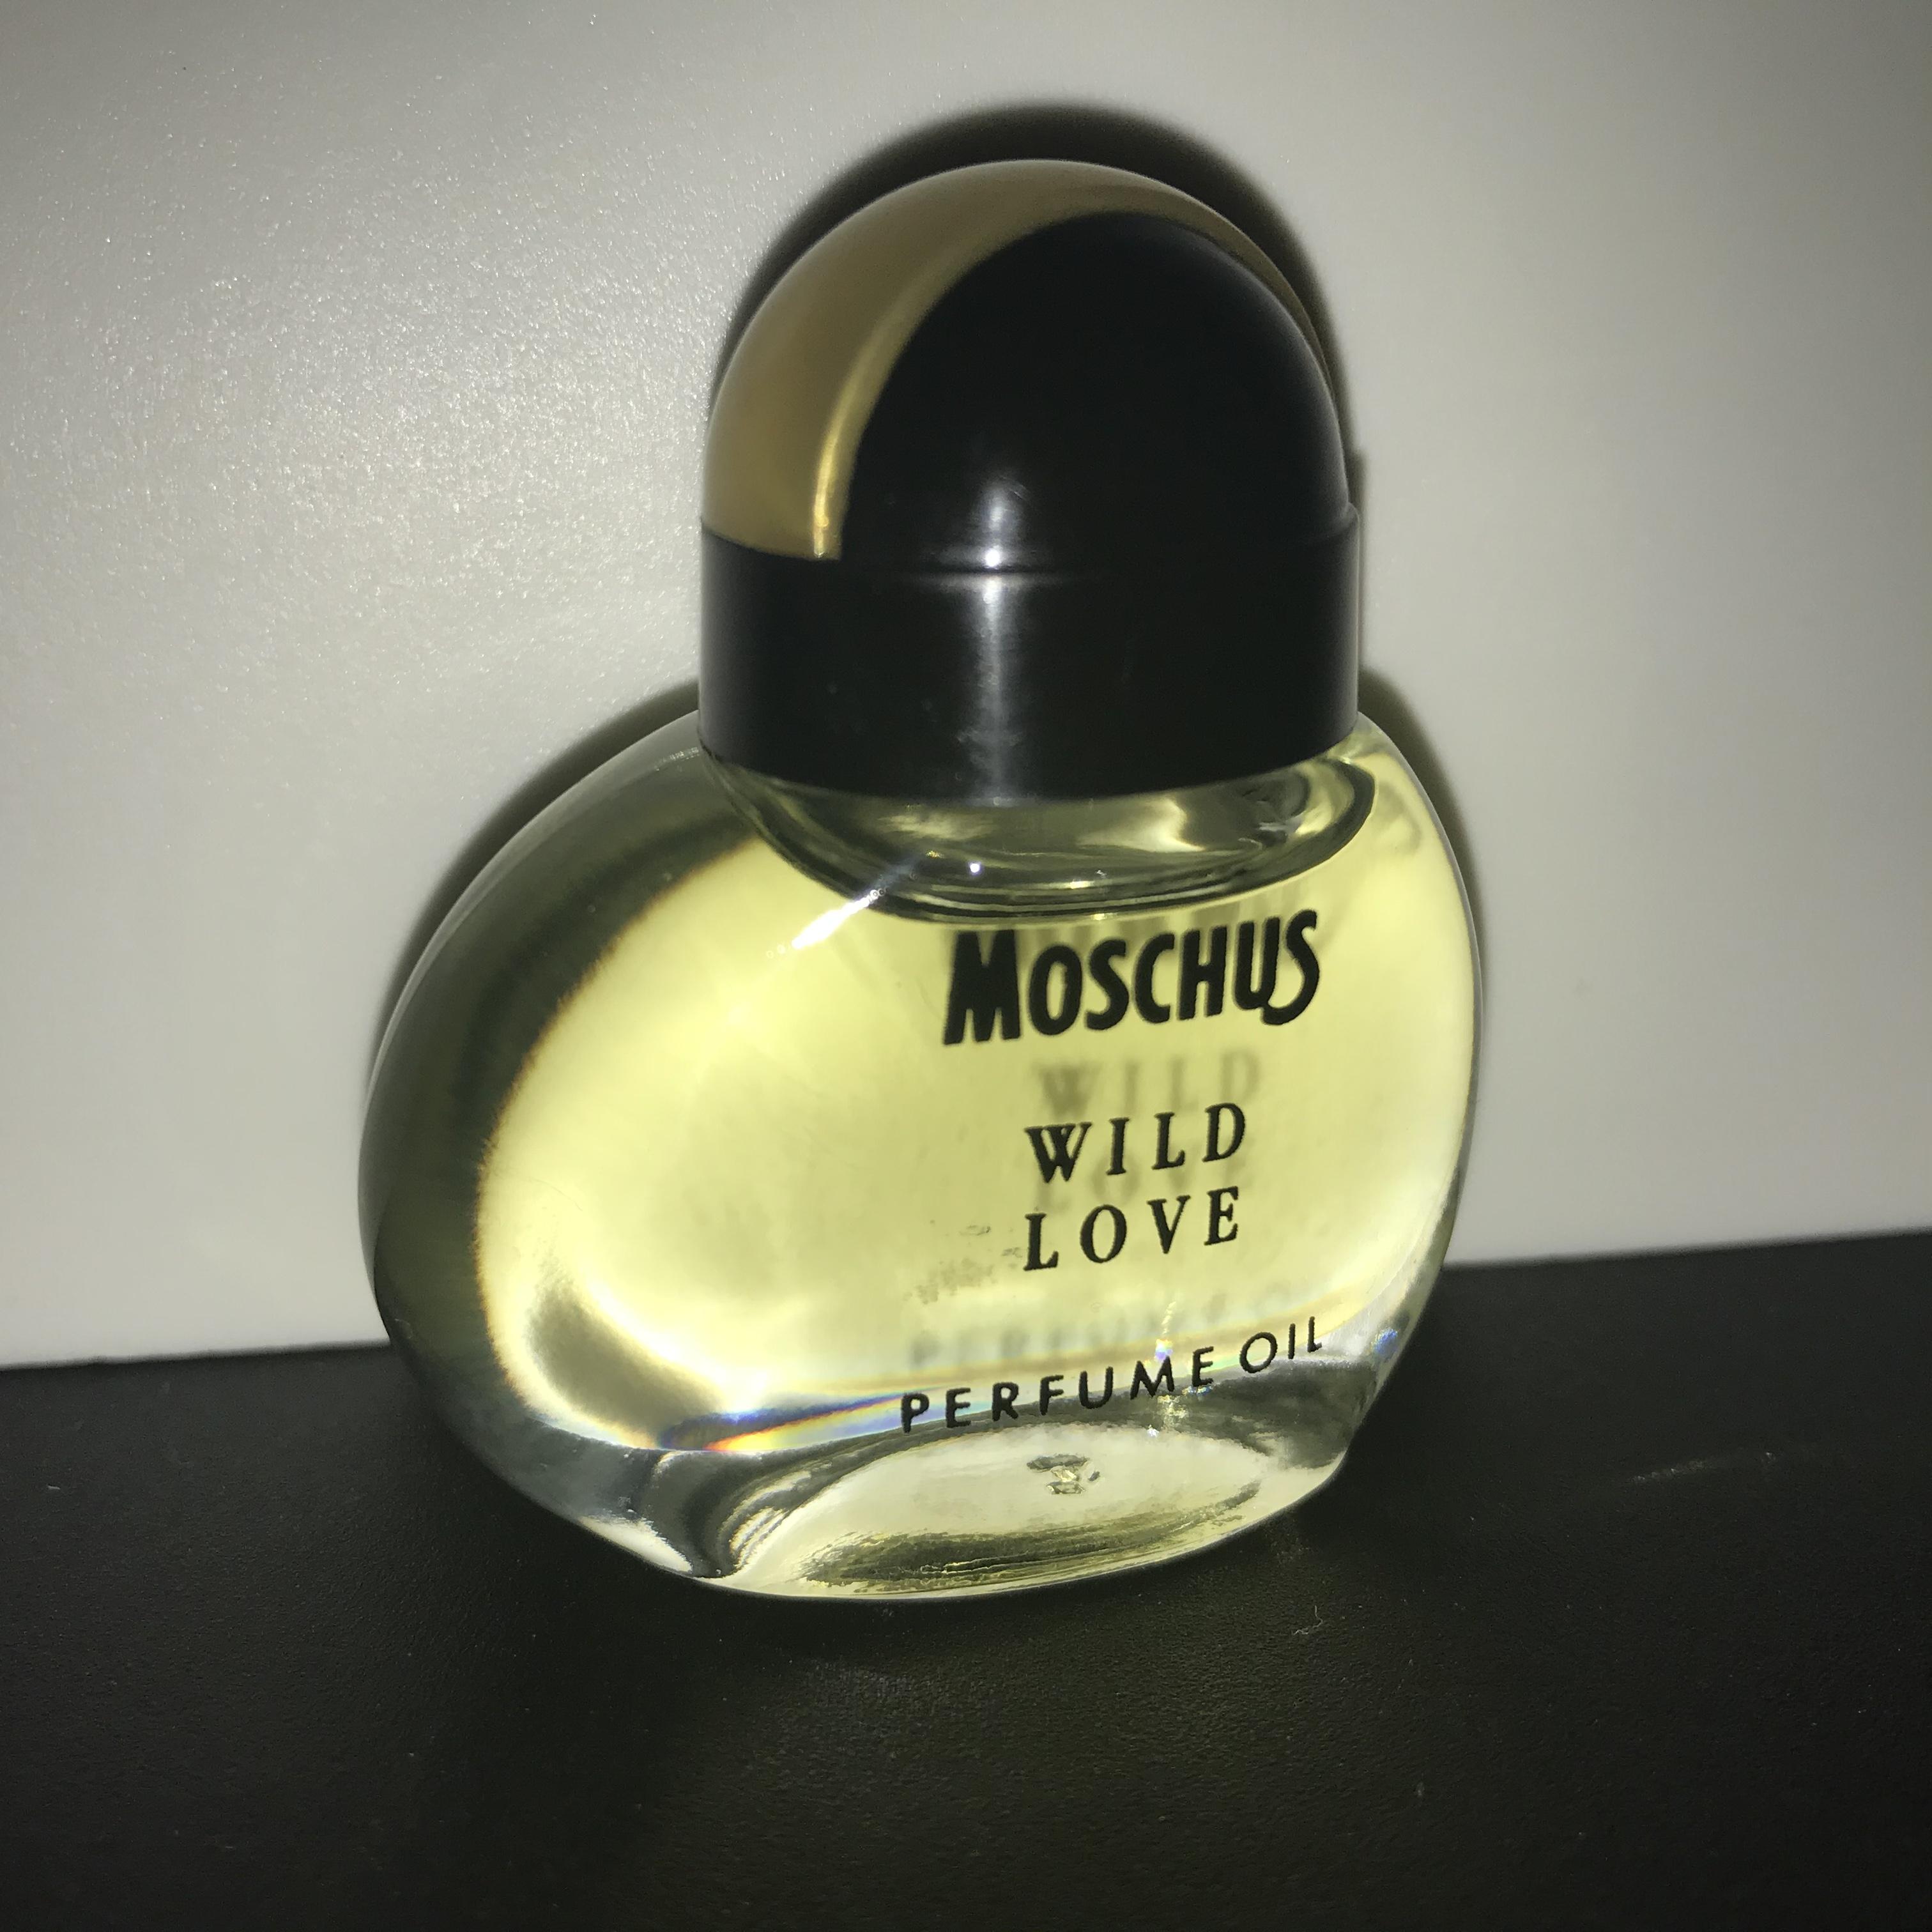 9 love perfume 5ml moschus wild oil Fragrances for